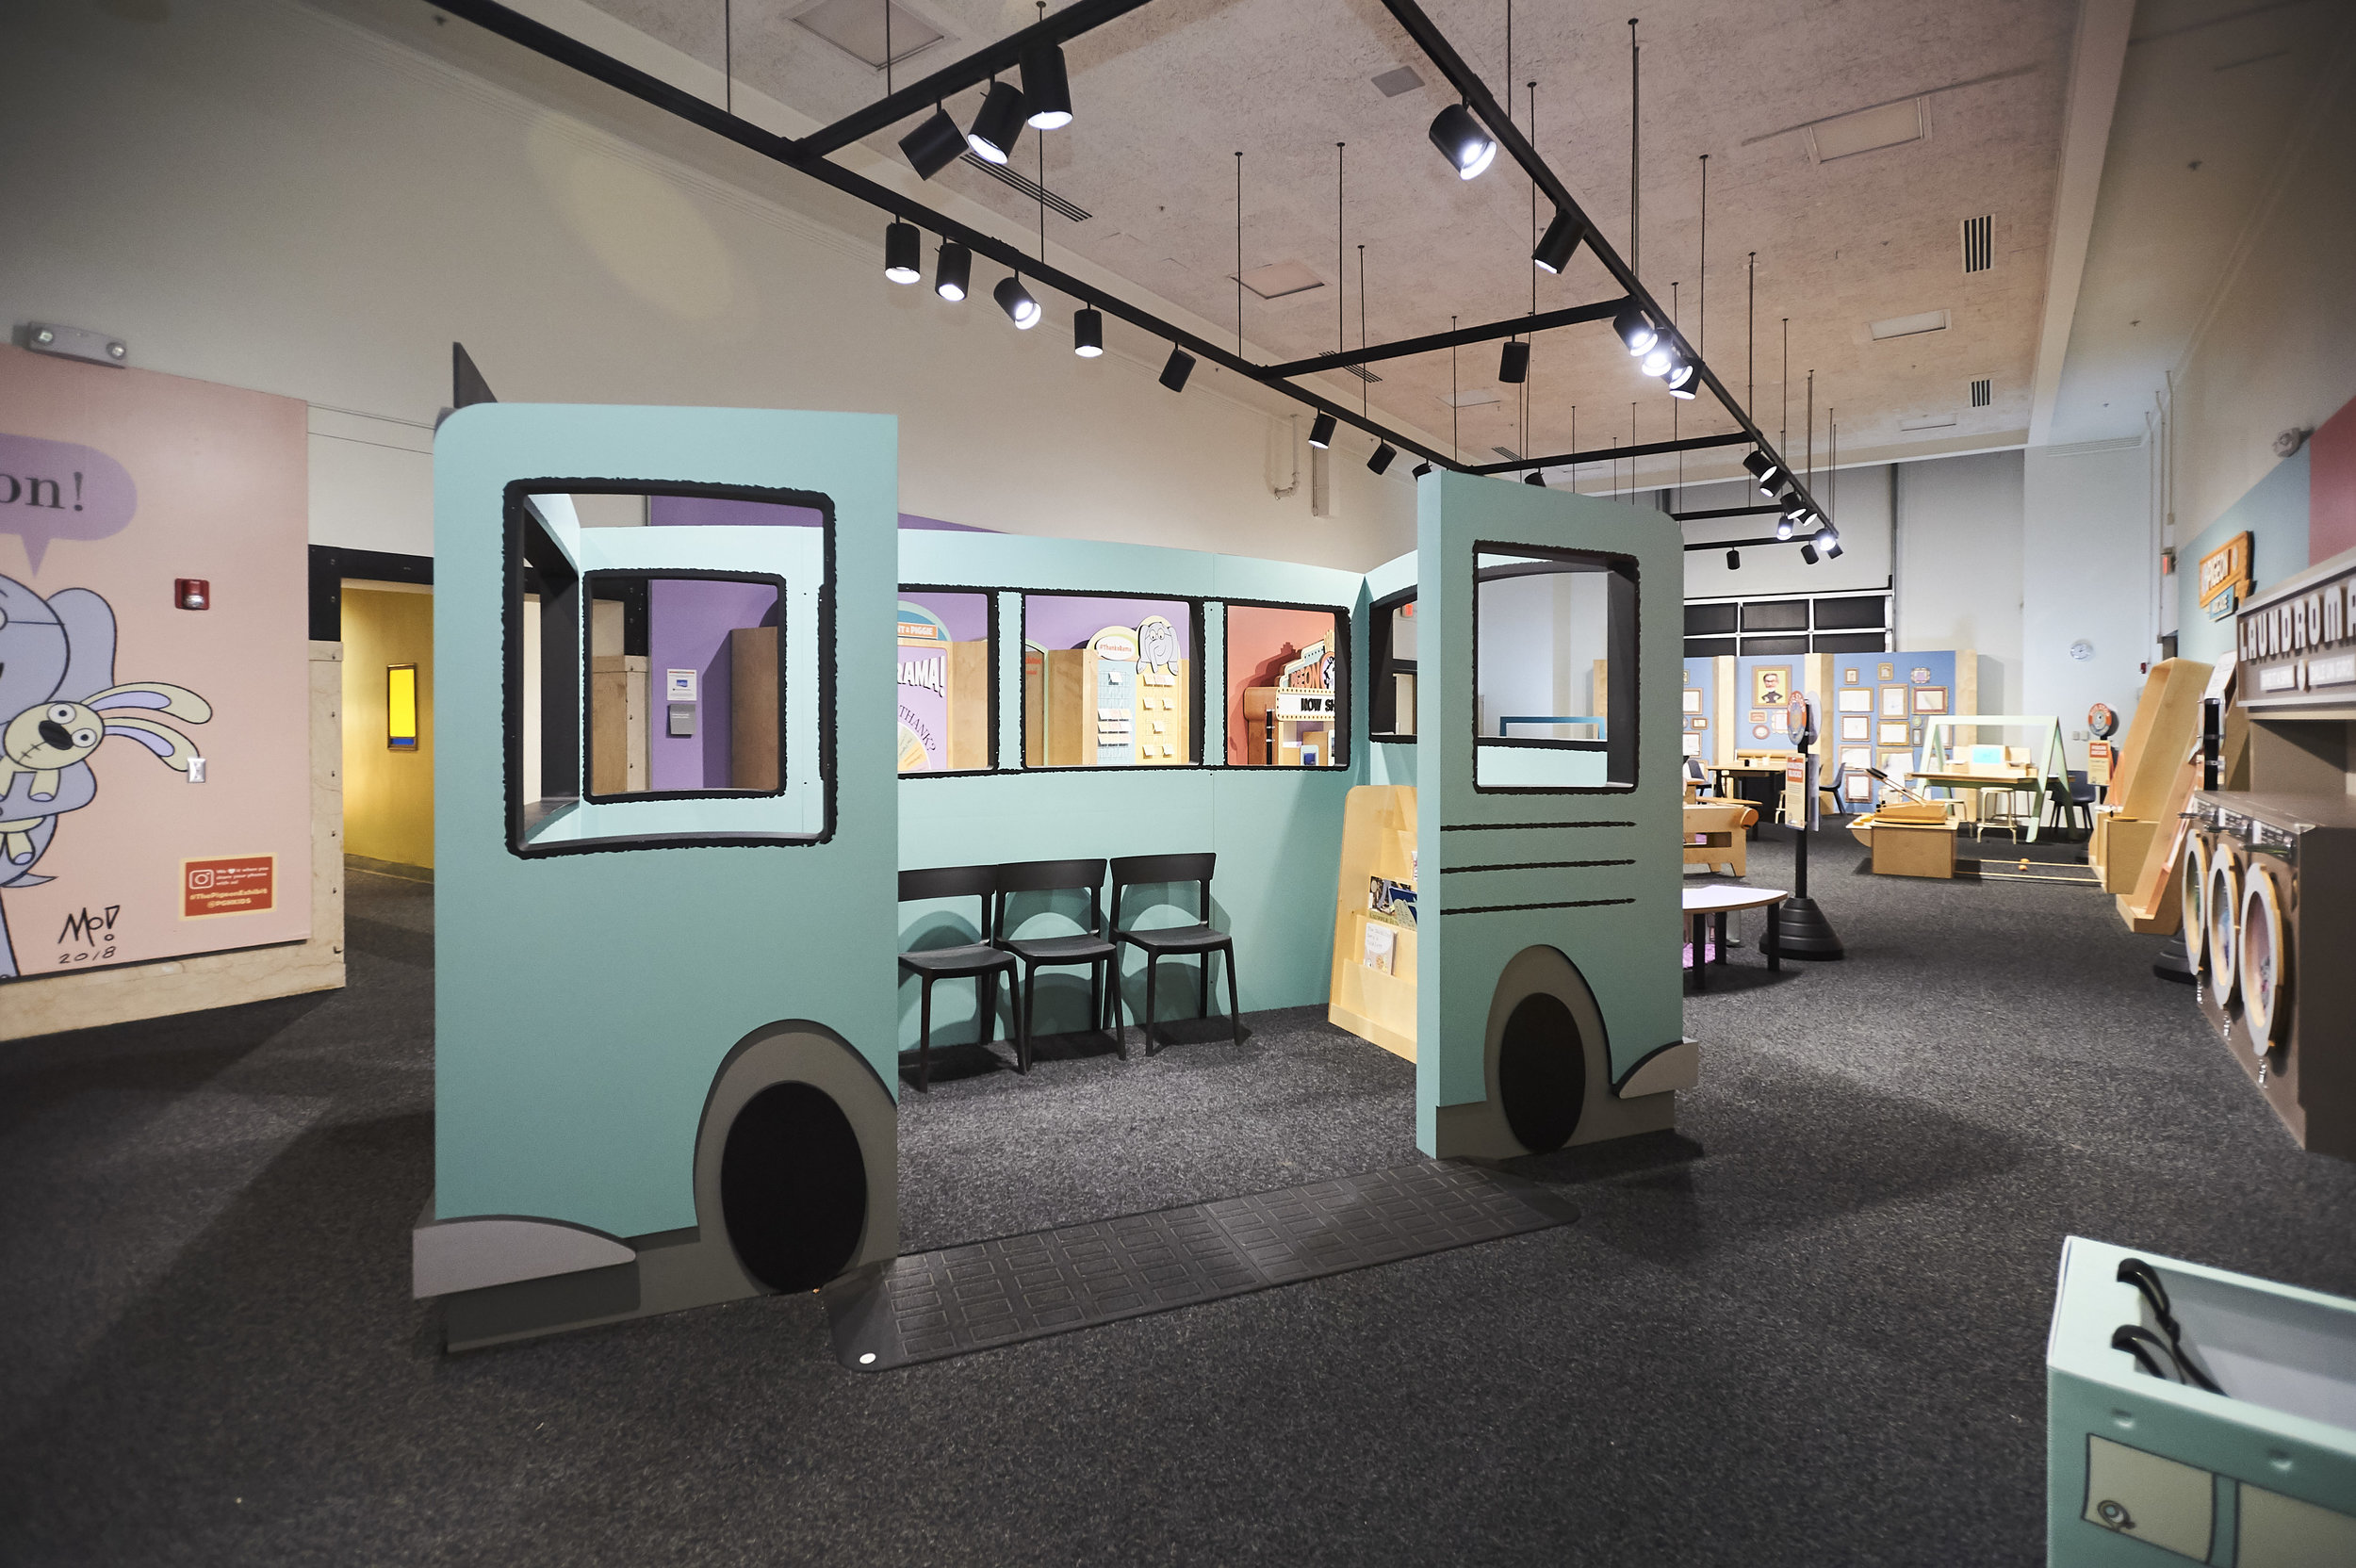 180425_ChildrensMuseum_Pigeon_264.jpg